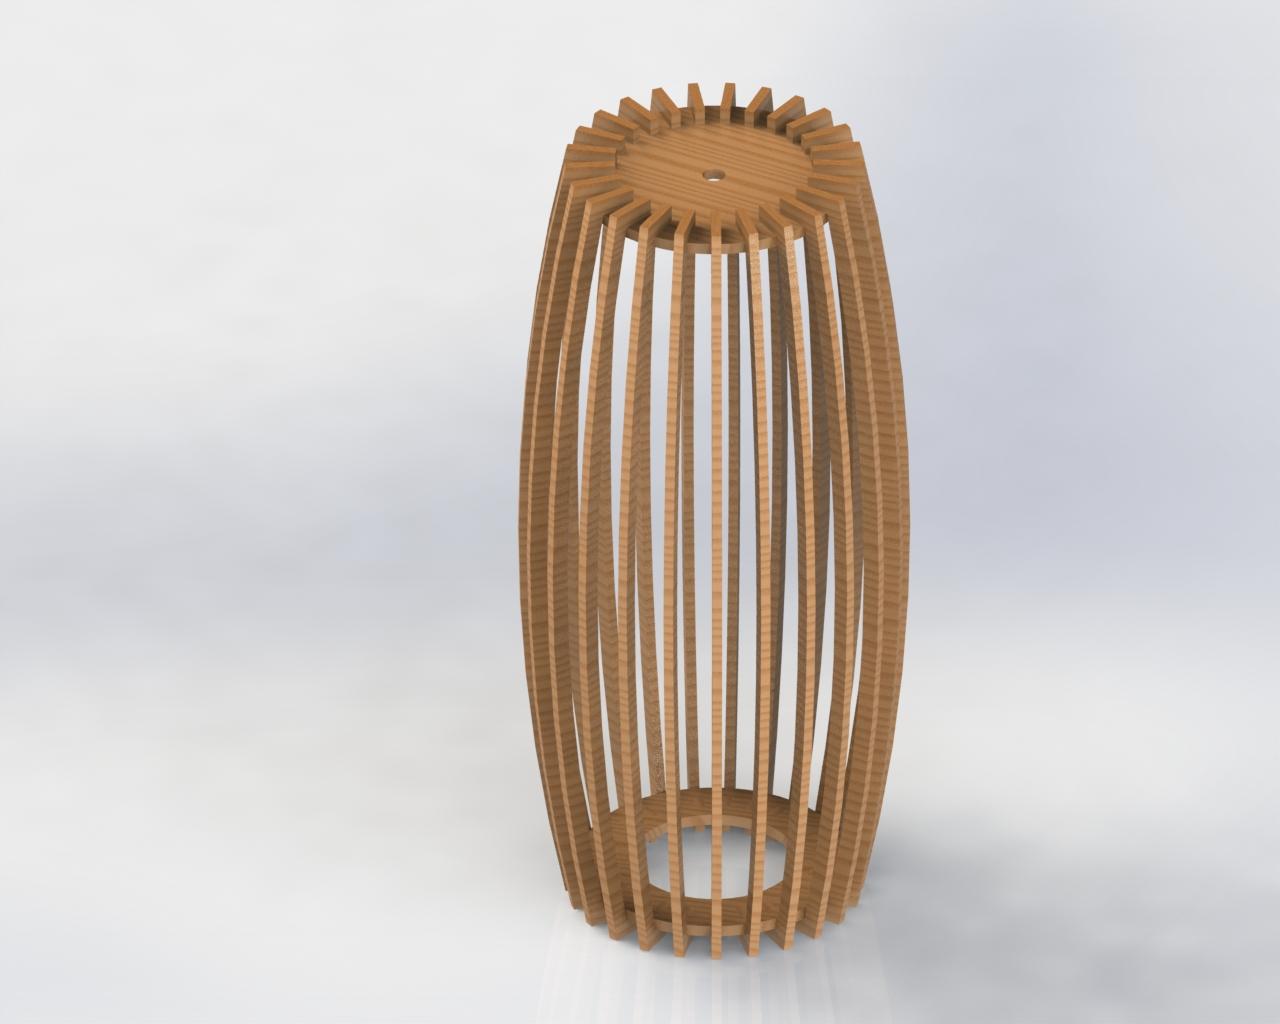 6x18 Lamp.JPG